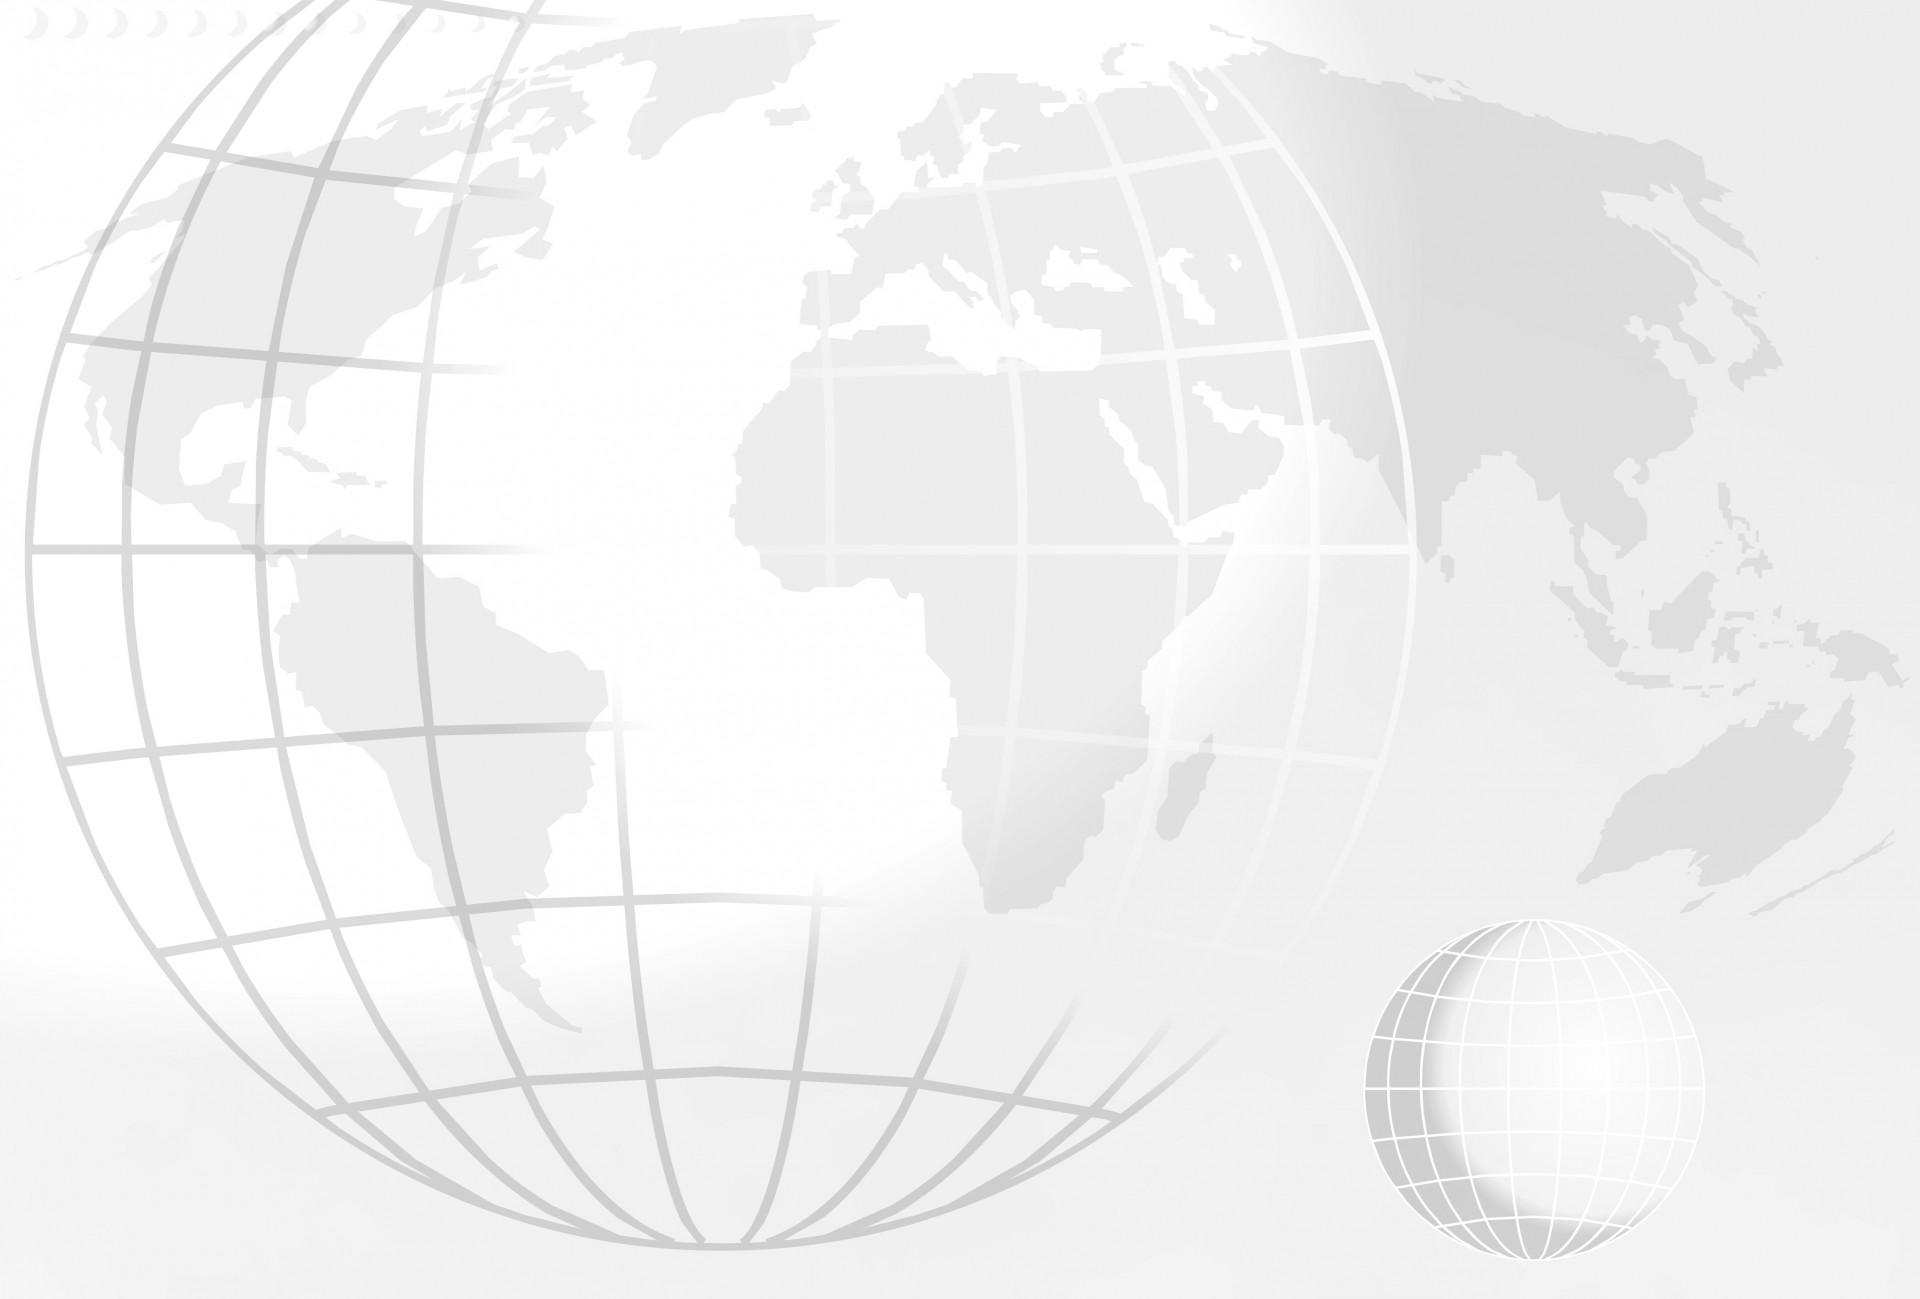 hight resolution of clipart clip nbsp art illustration graphic world globe travel